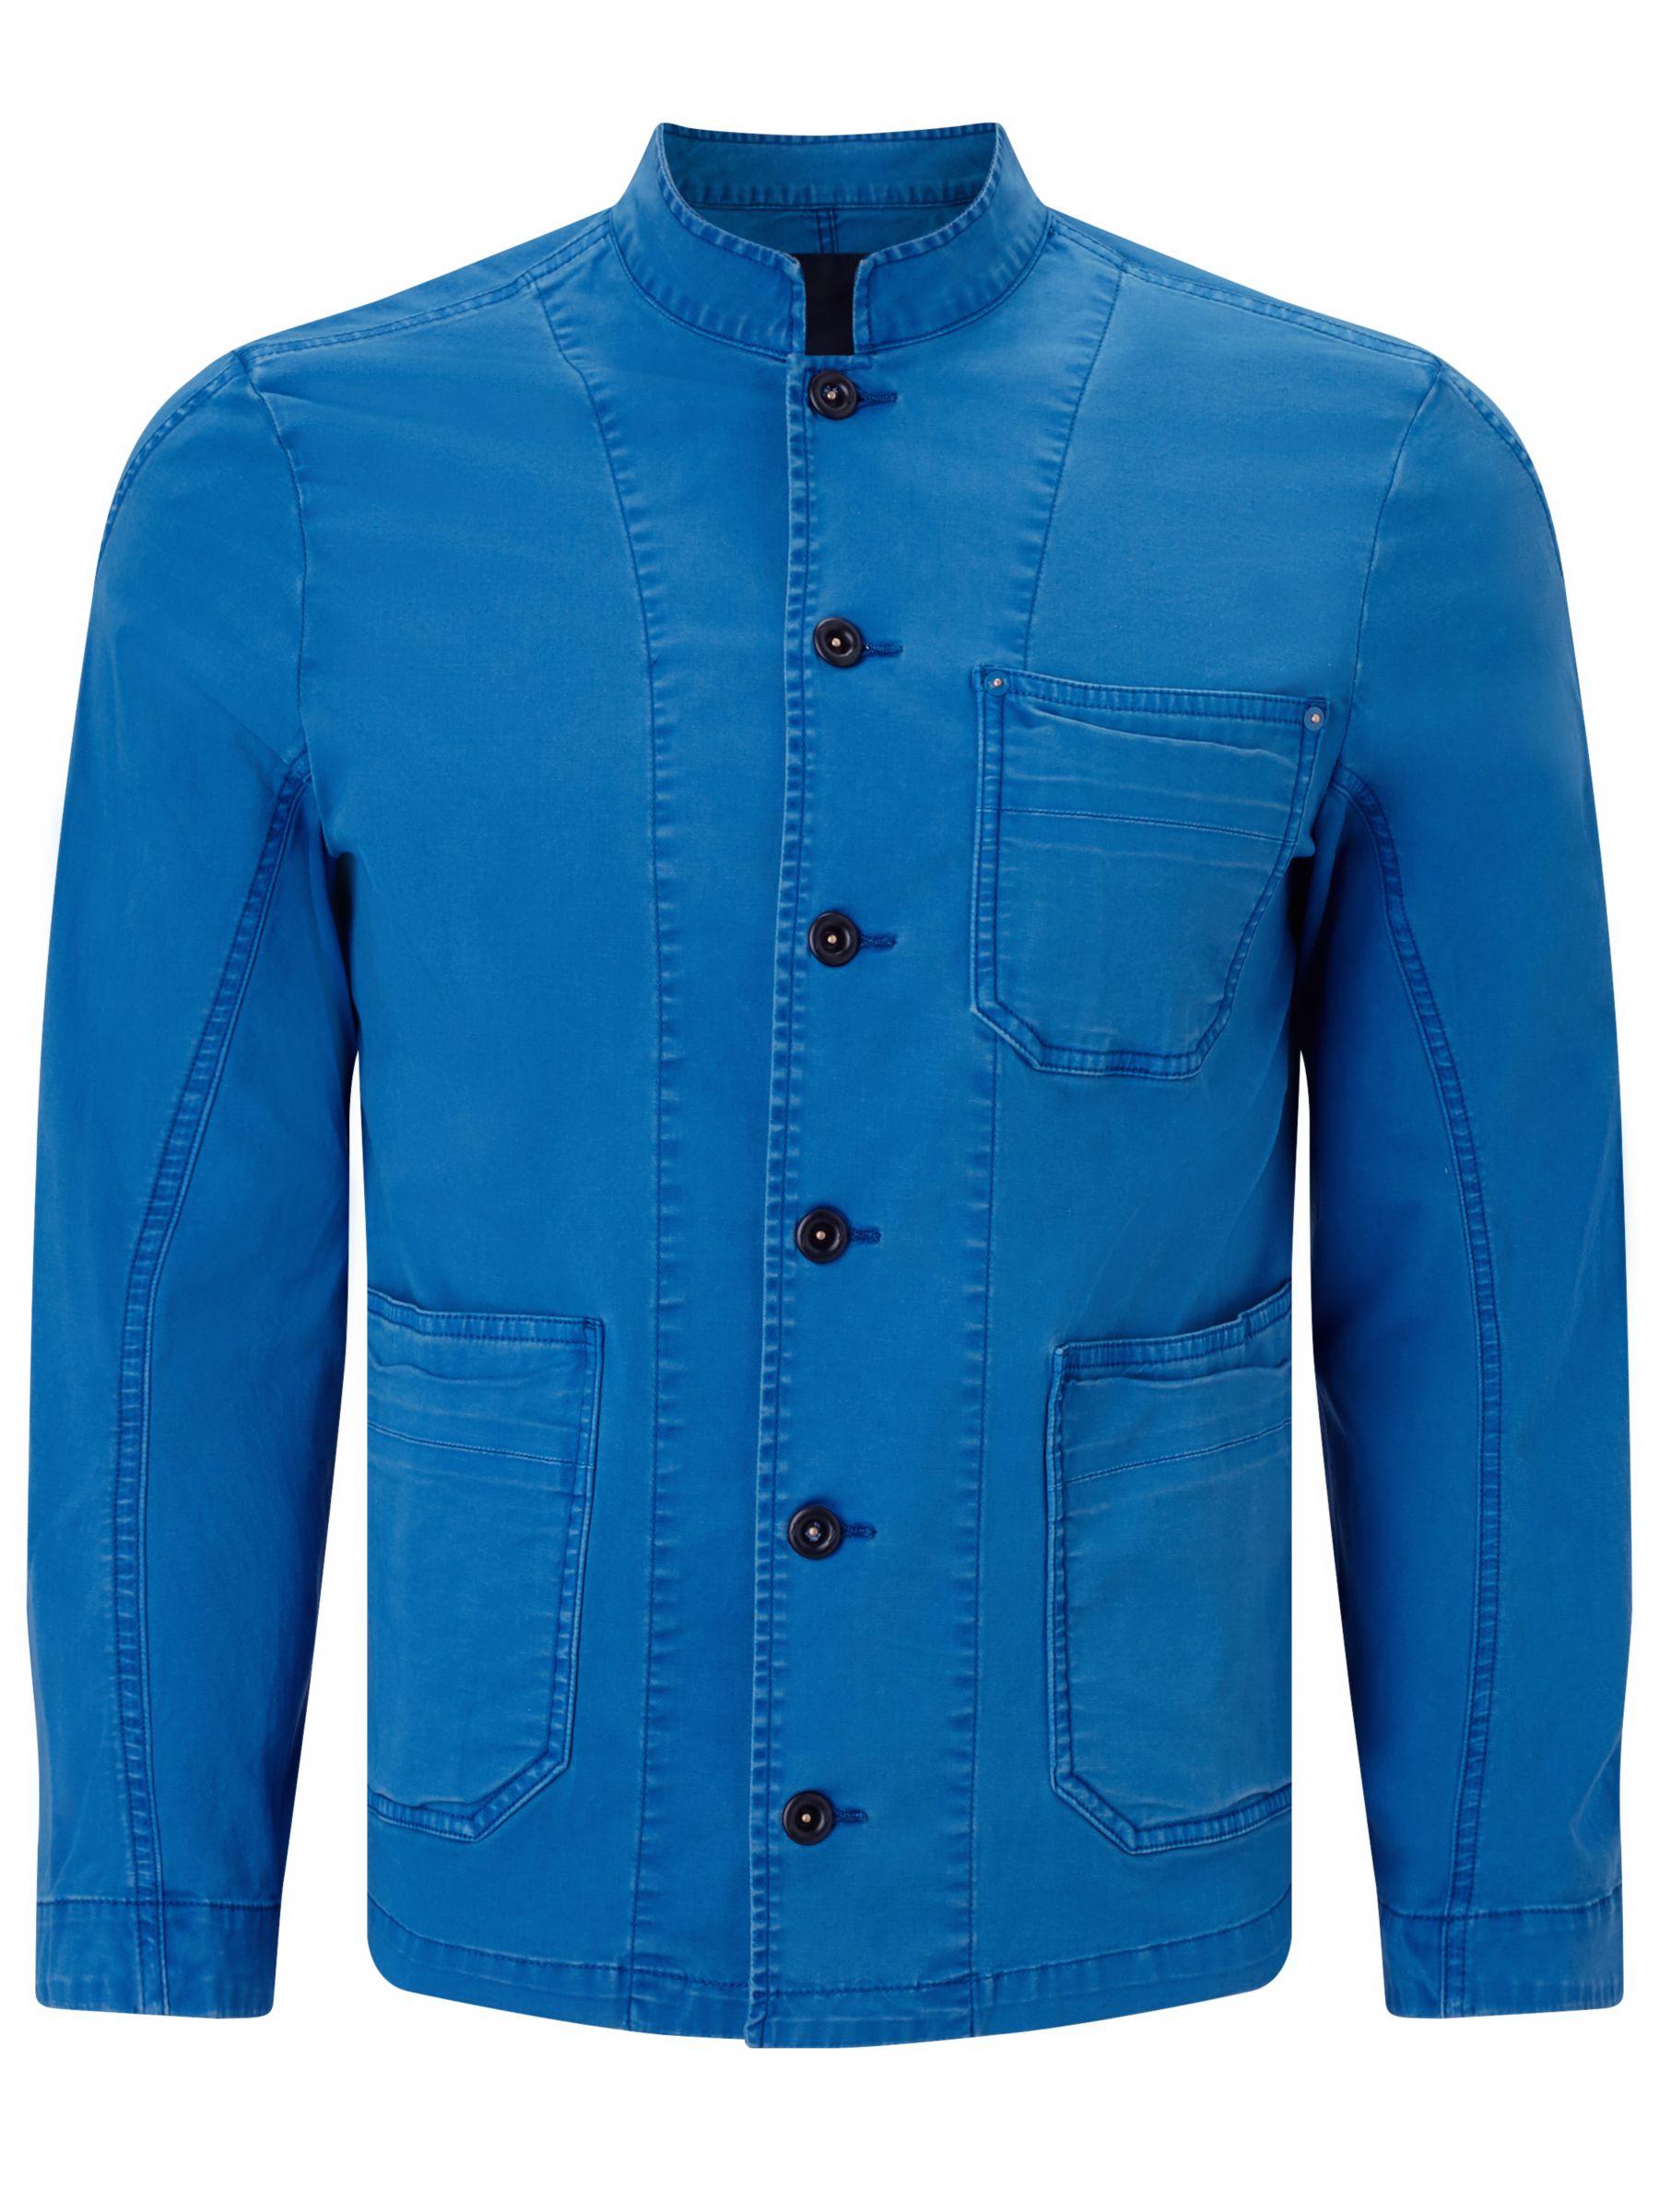 Denham Denham Mao Apex Workwear Jacket, Blue City